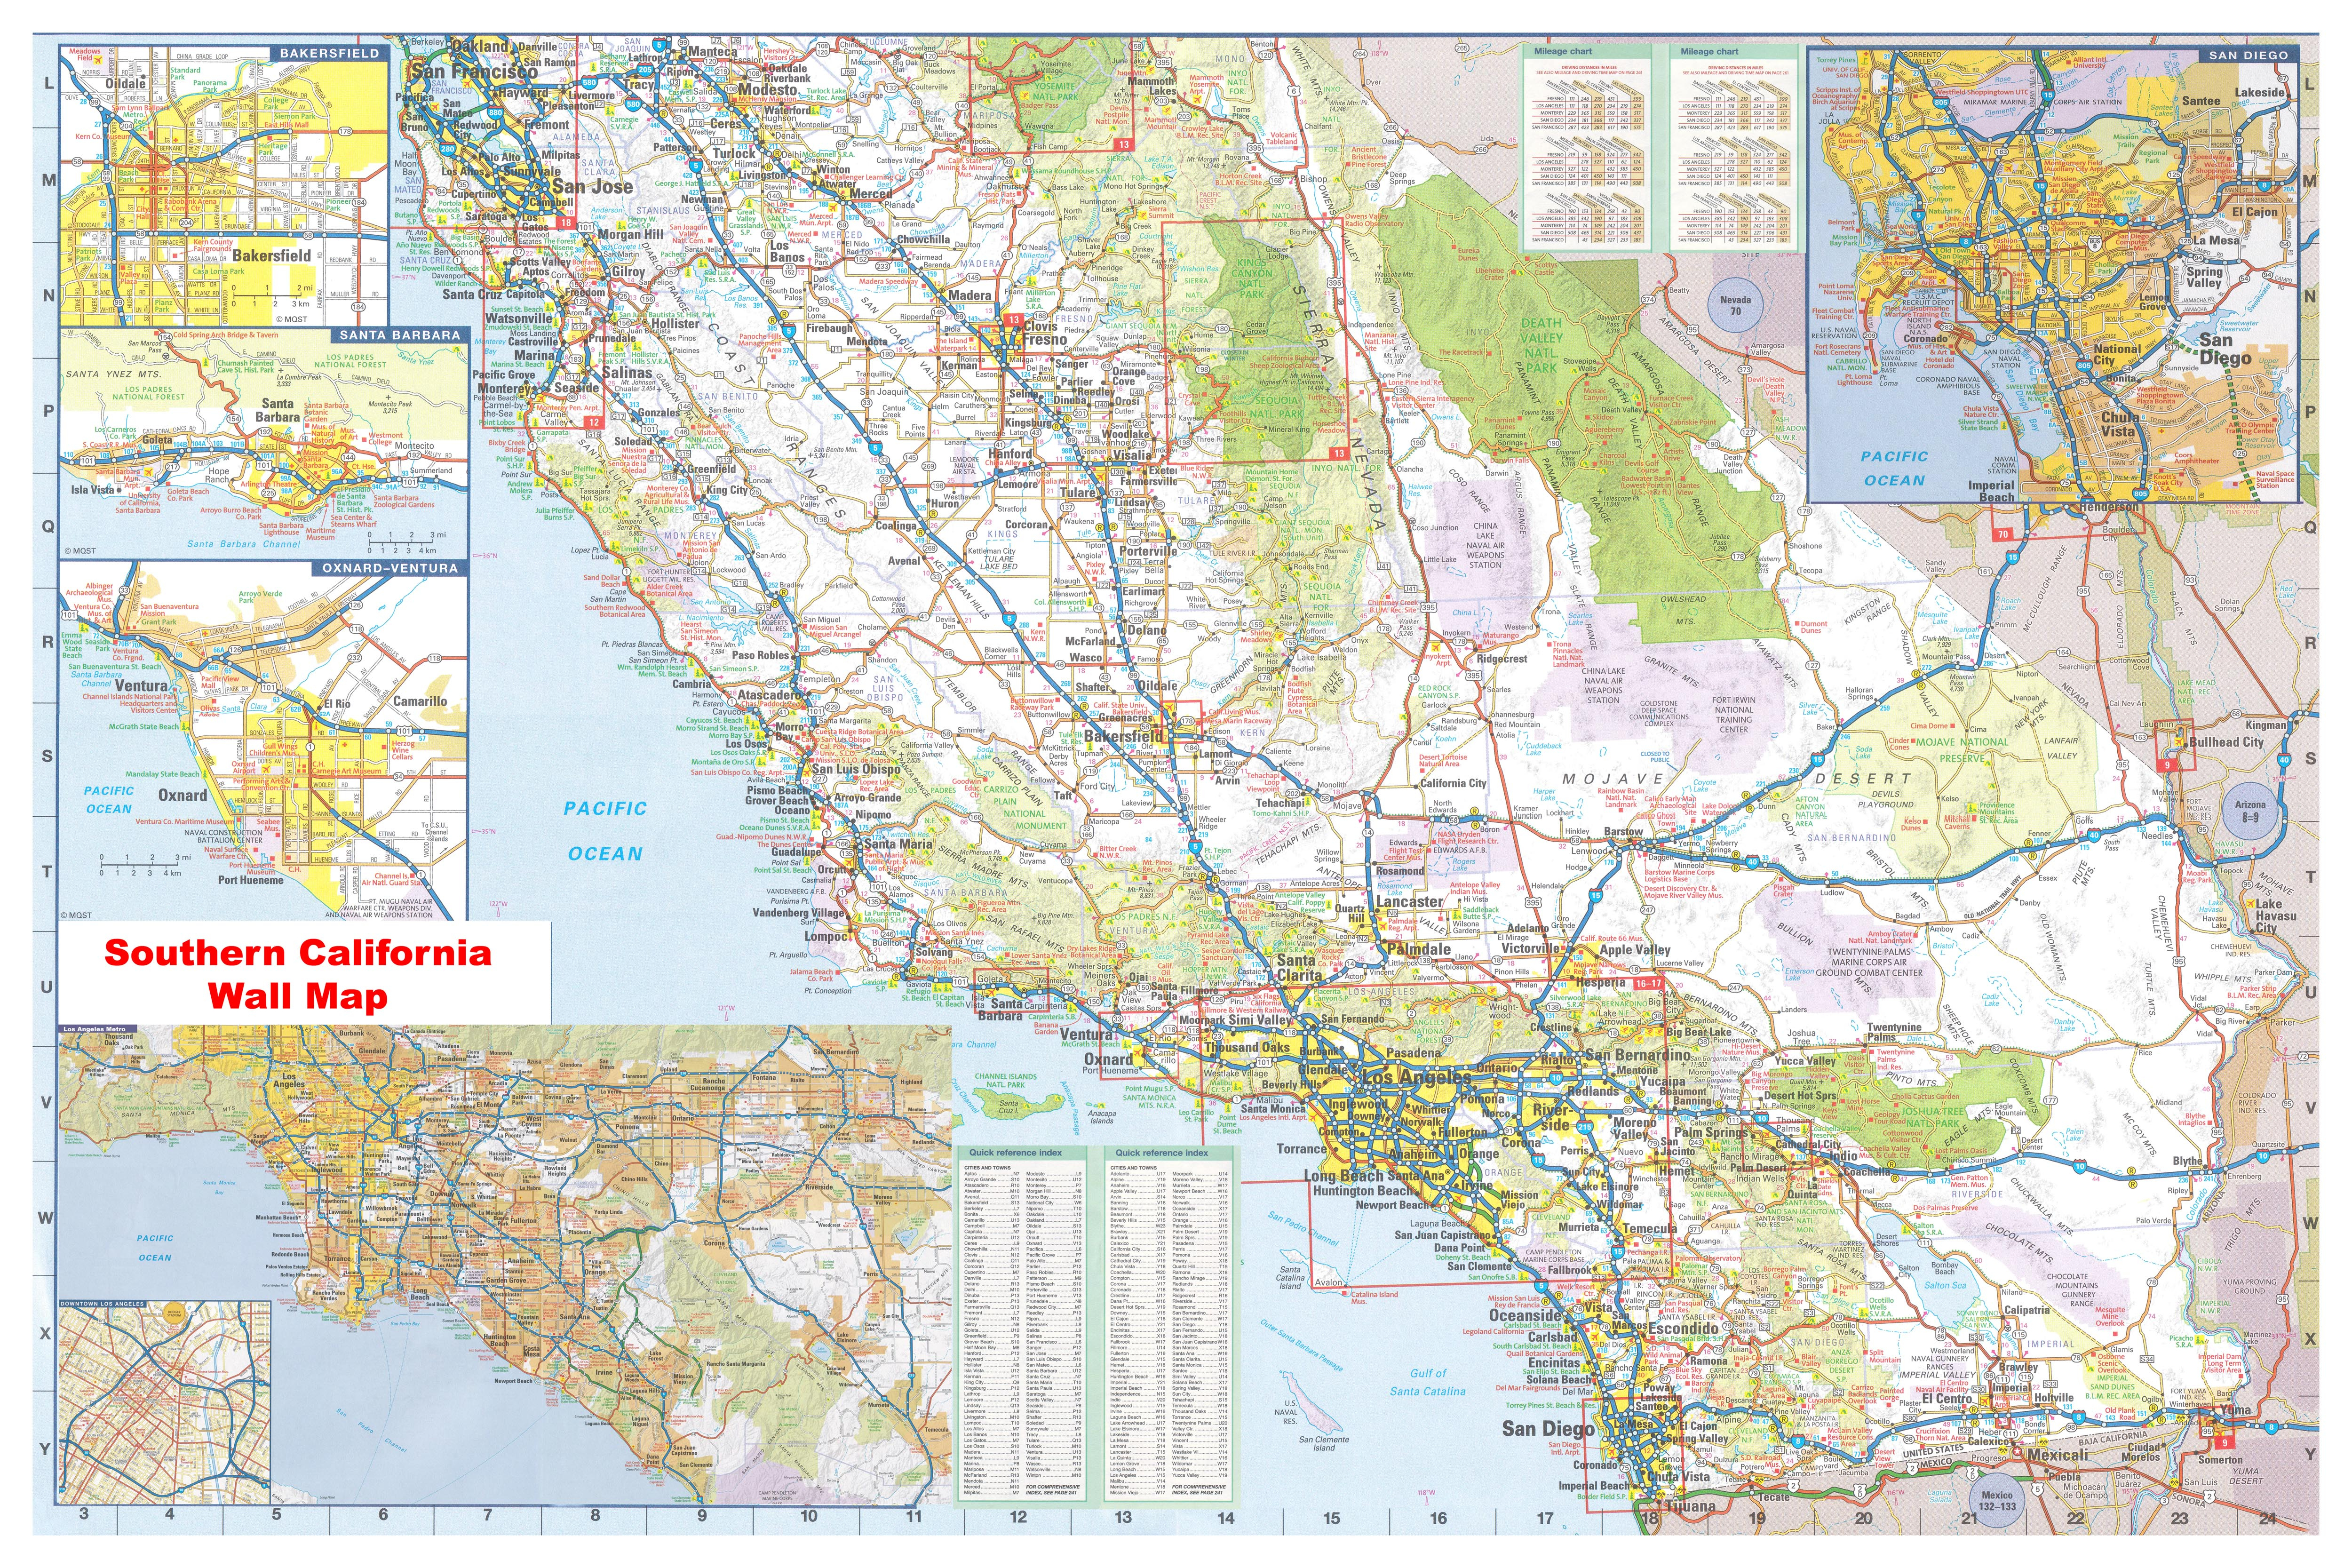 California Southern Wall Map Executive Commercial Edition - Laminated California Wall Map